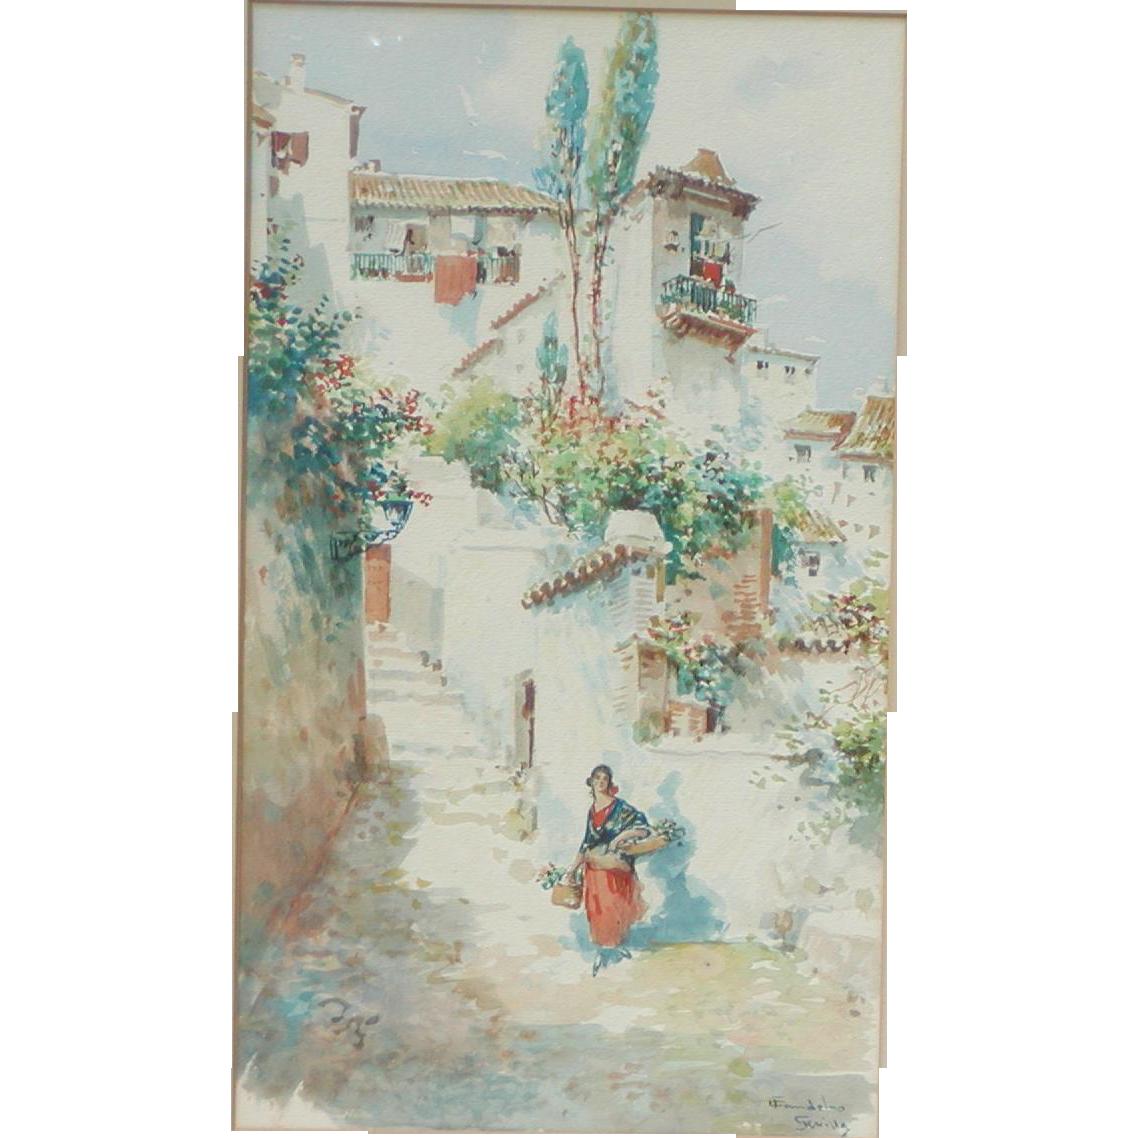 Sevilla Spain painting...Painting of a Spanish street scene...